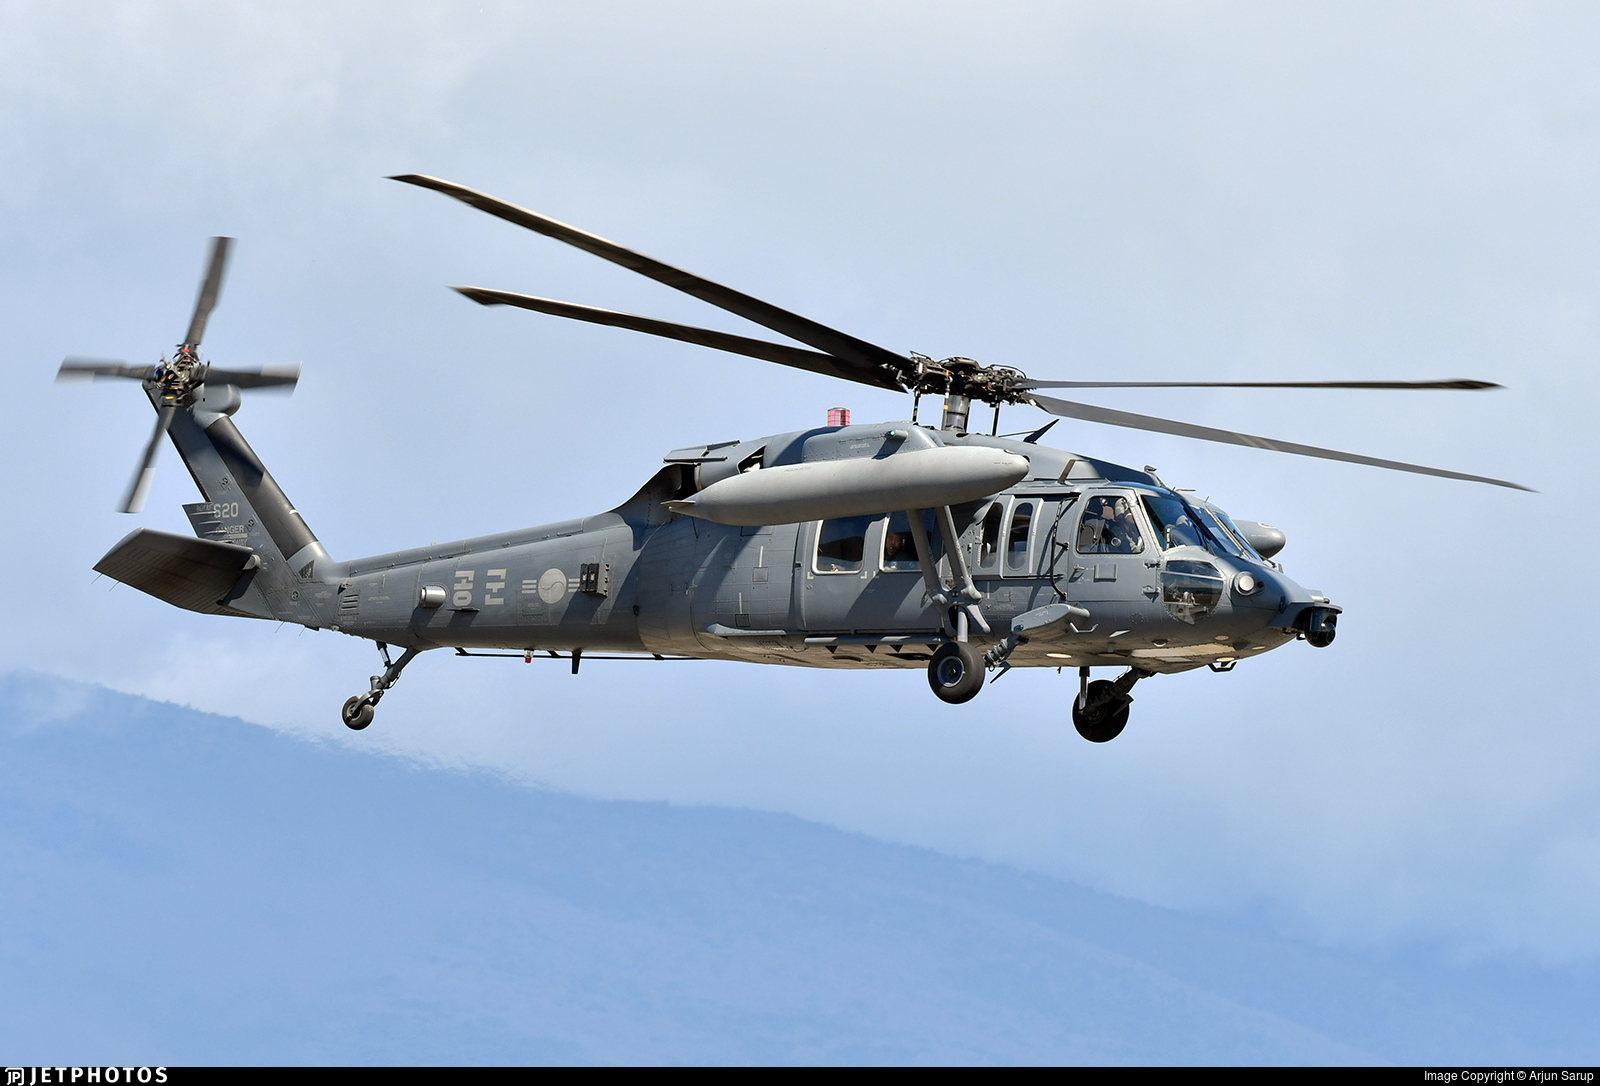 01-620 - Sikorsky UH-60P Blackhawk - South Korea - Air Force